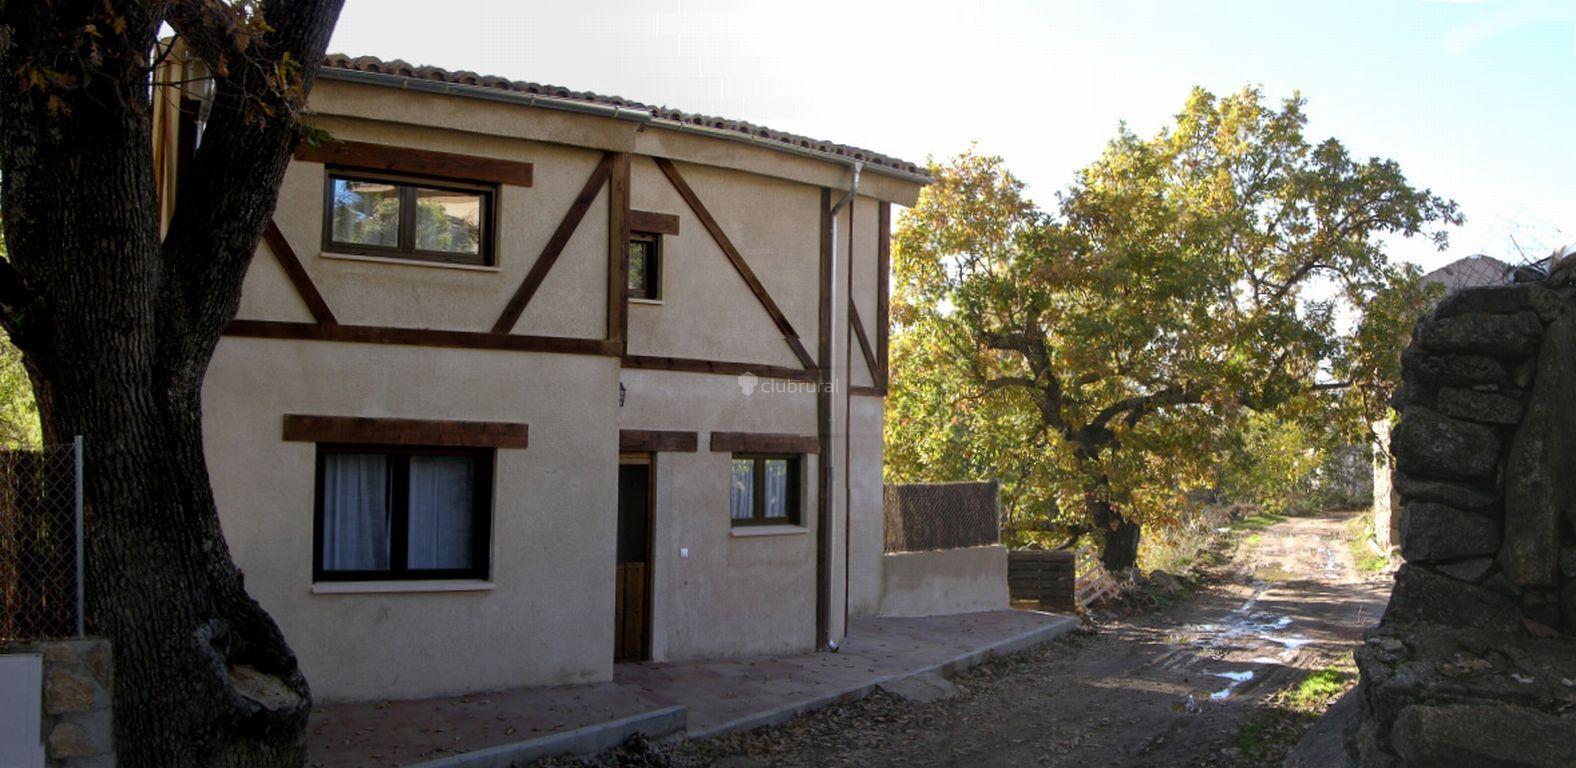 Fotos de complejo rural villanueva vila villanueva de avila clubrural - Casa rural gea de albarracin ...